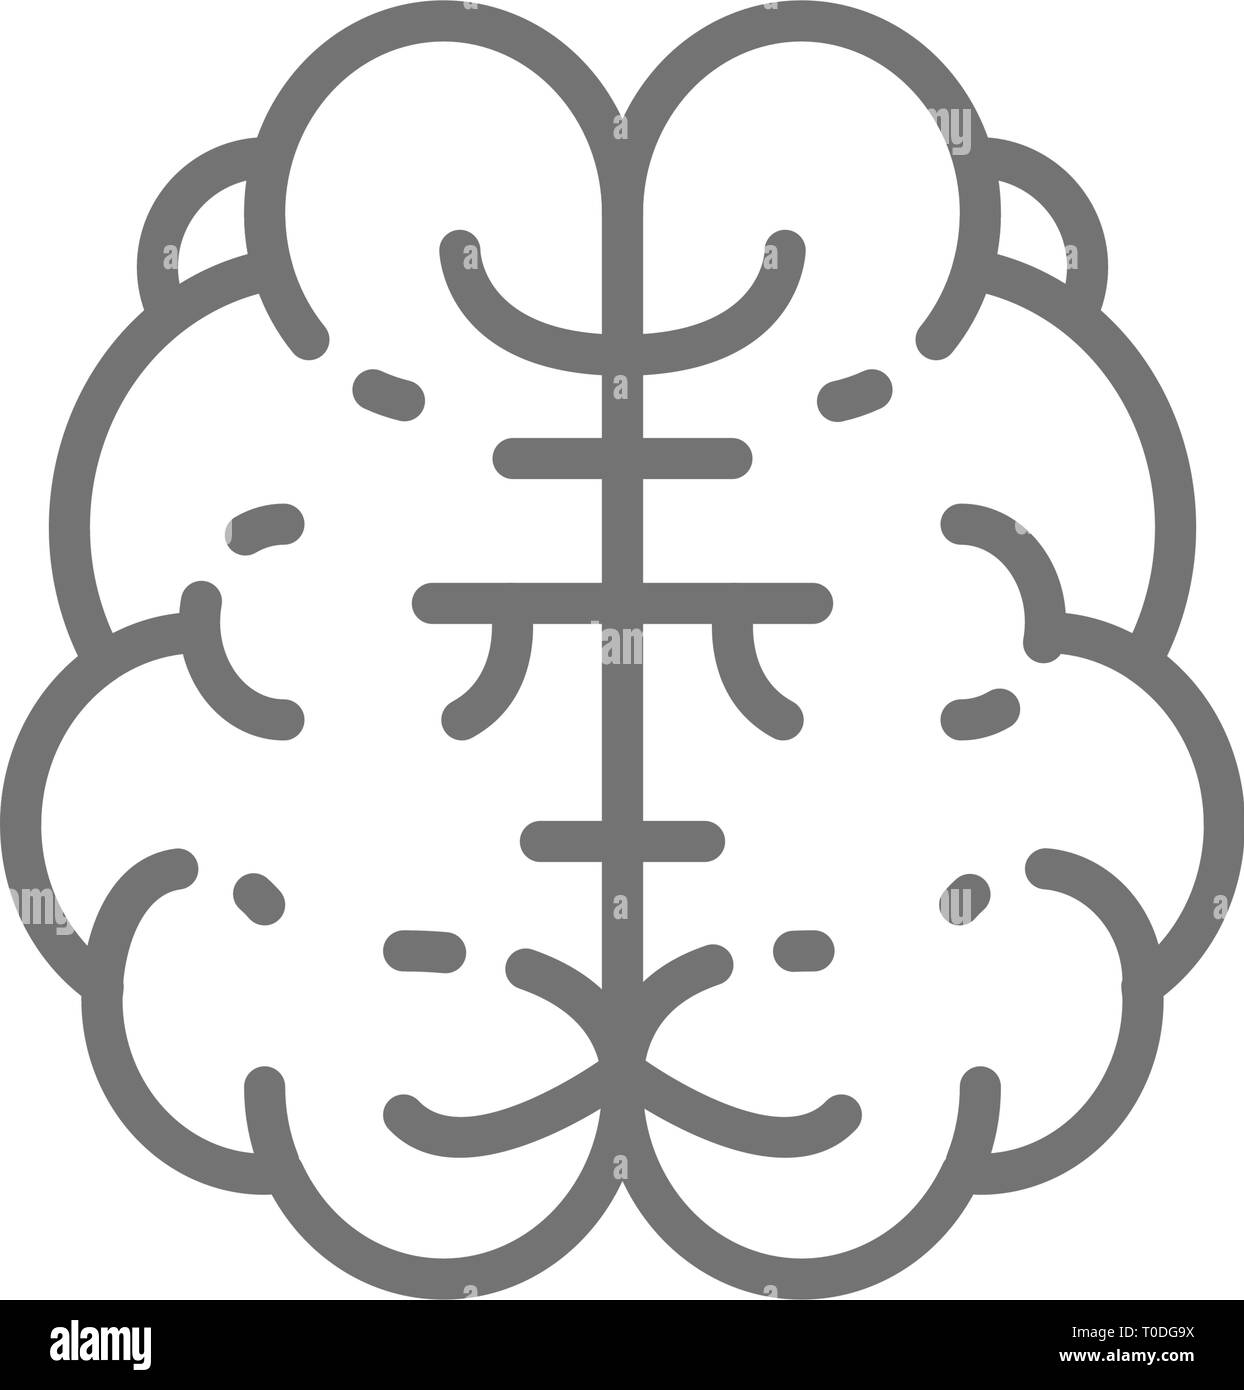 Brain, mind, intelligence, human organ line icon. - Stock Image